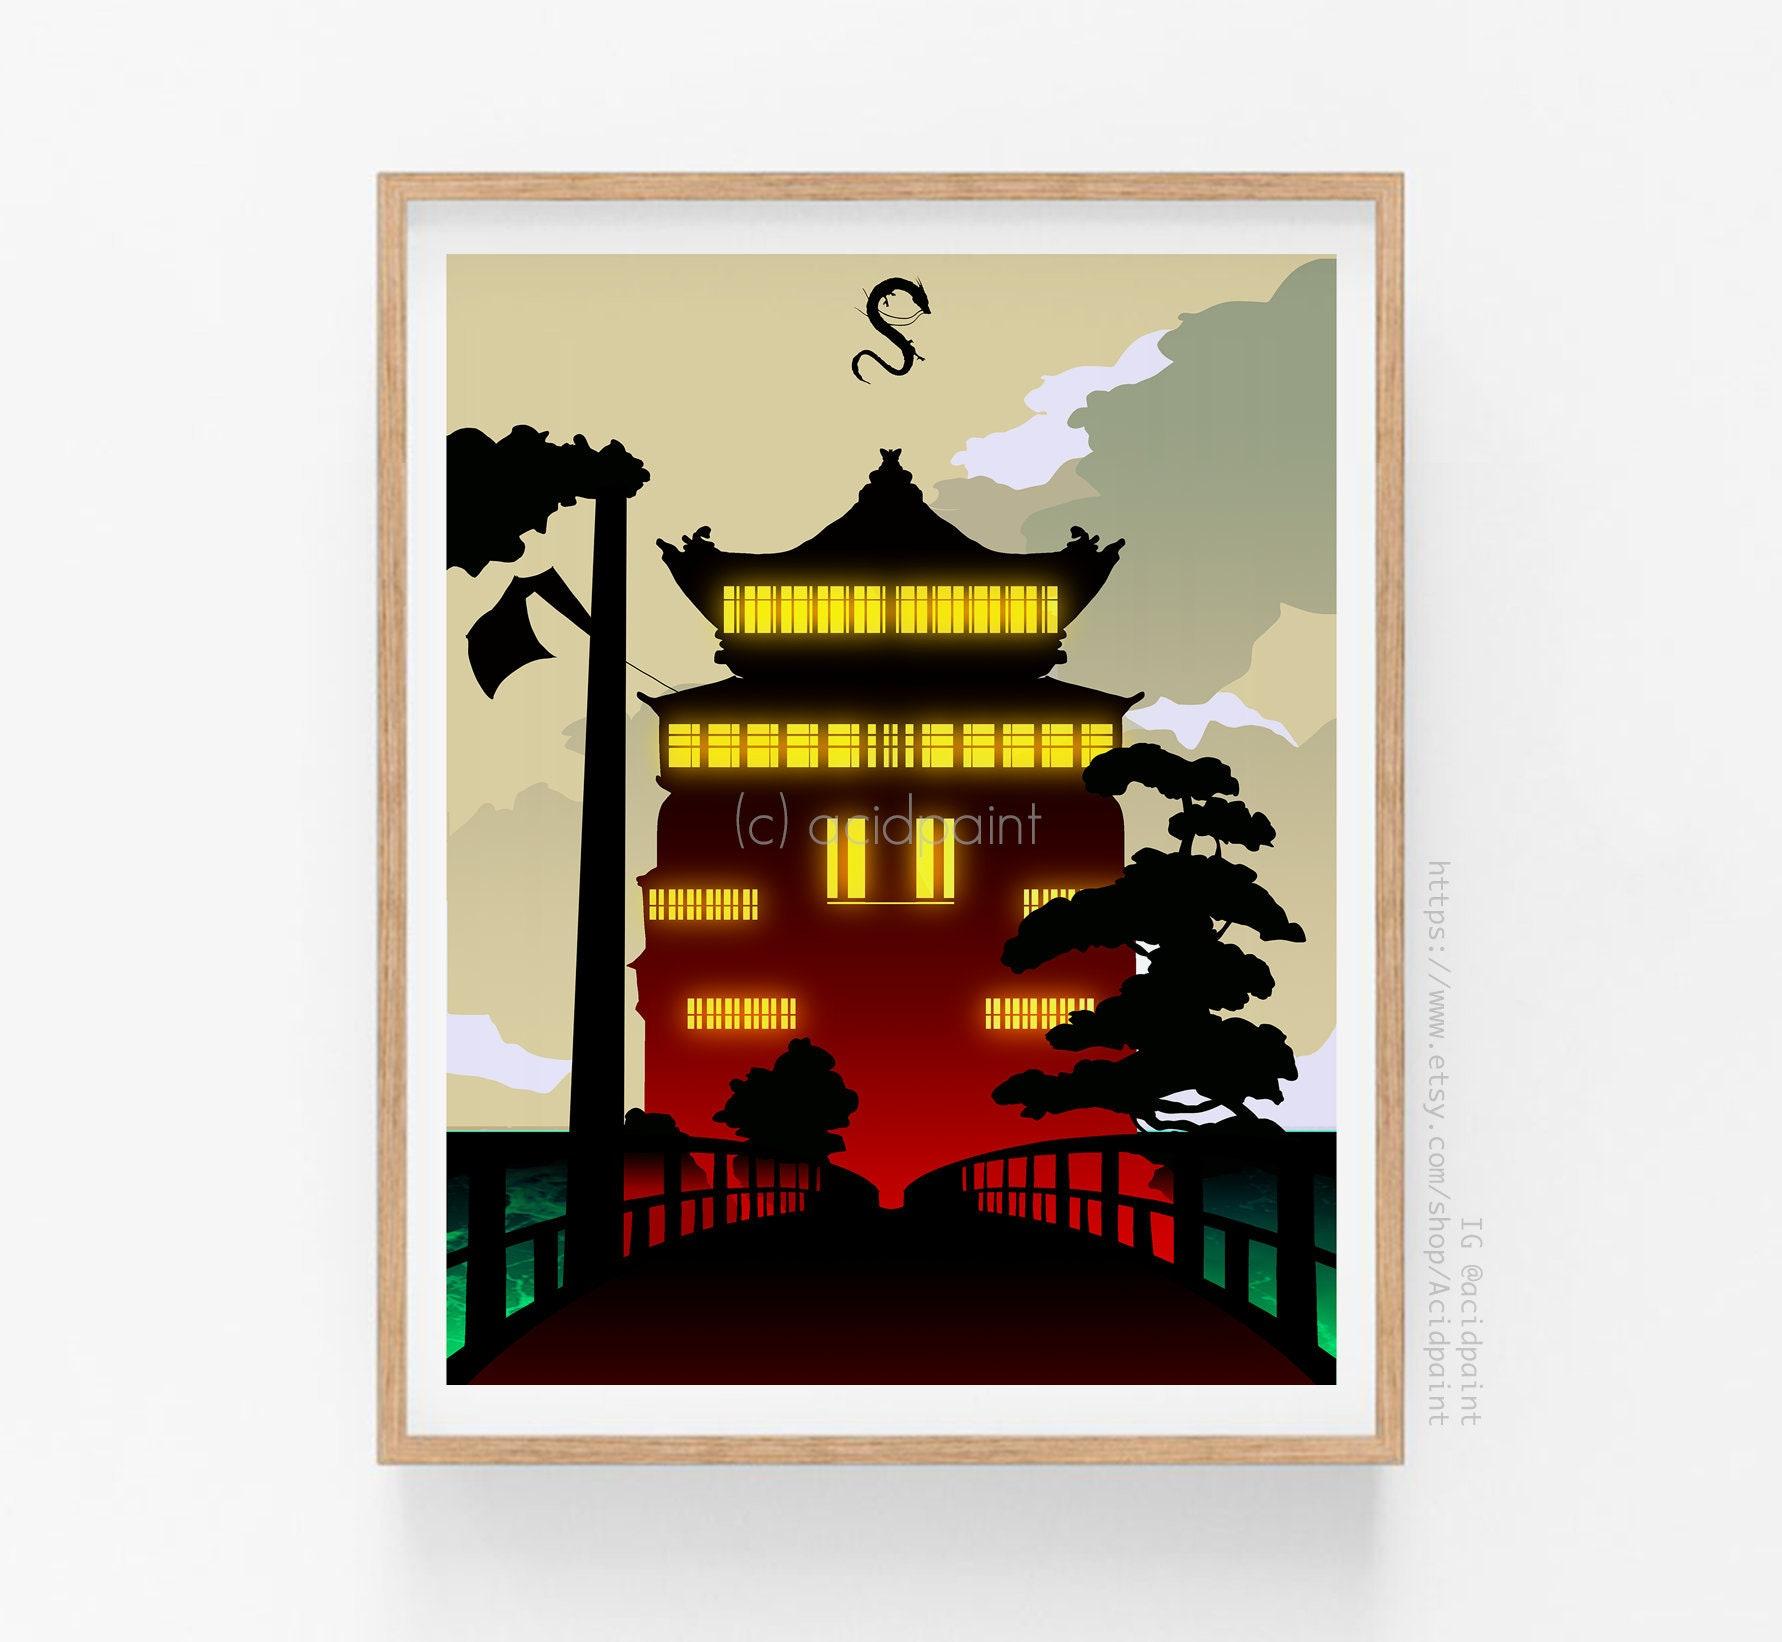 Studio Ghibli Prints Spirited Away Poster Bathhouse Chihiro Etsy